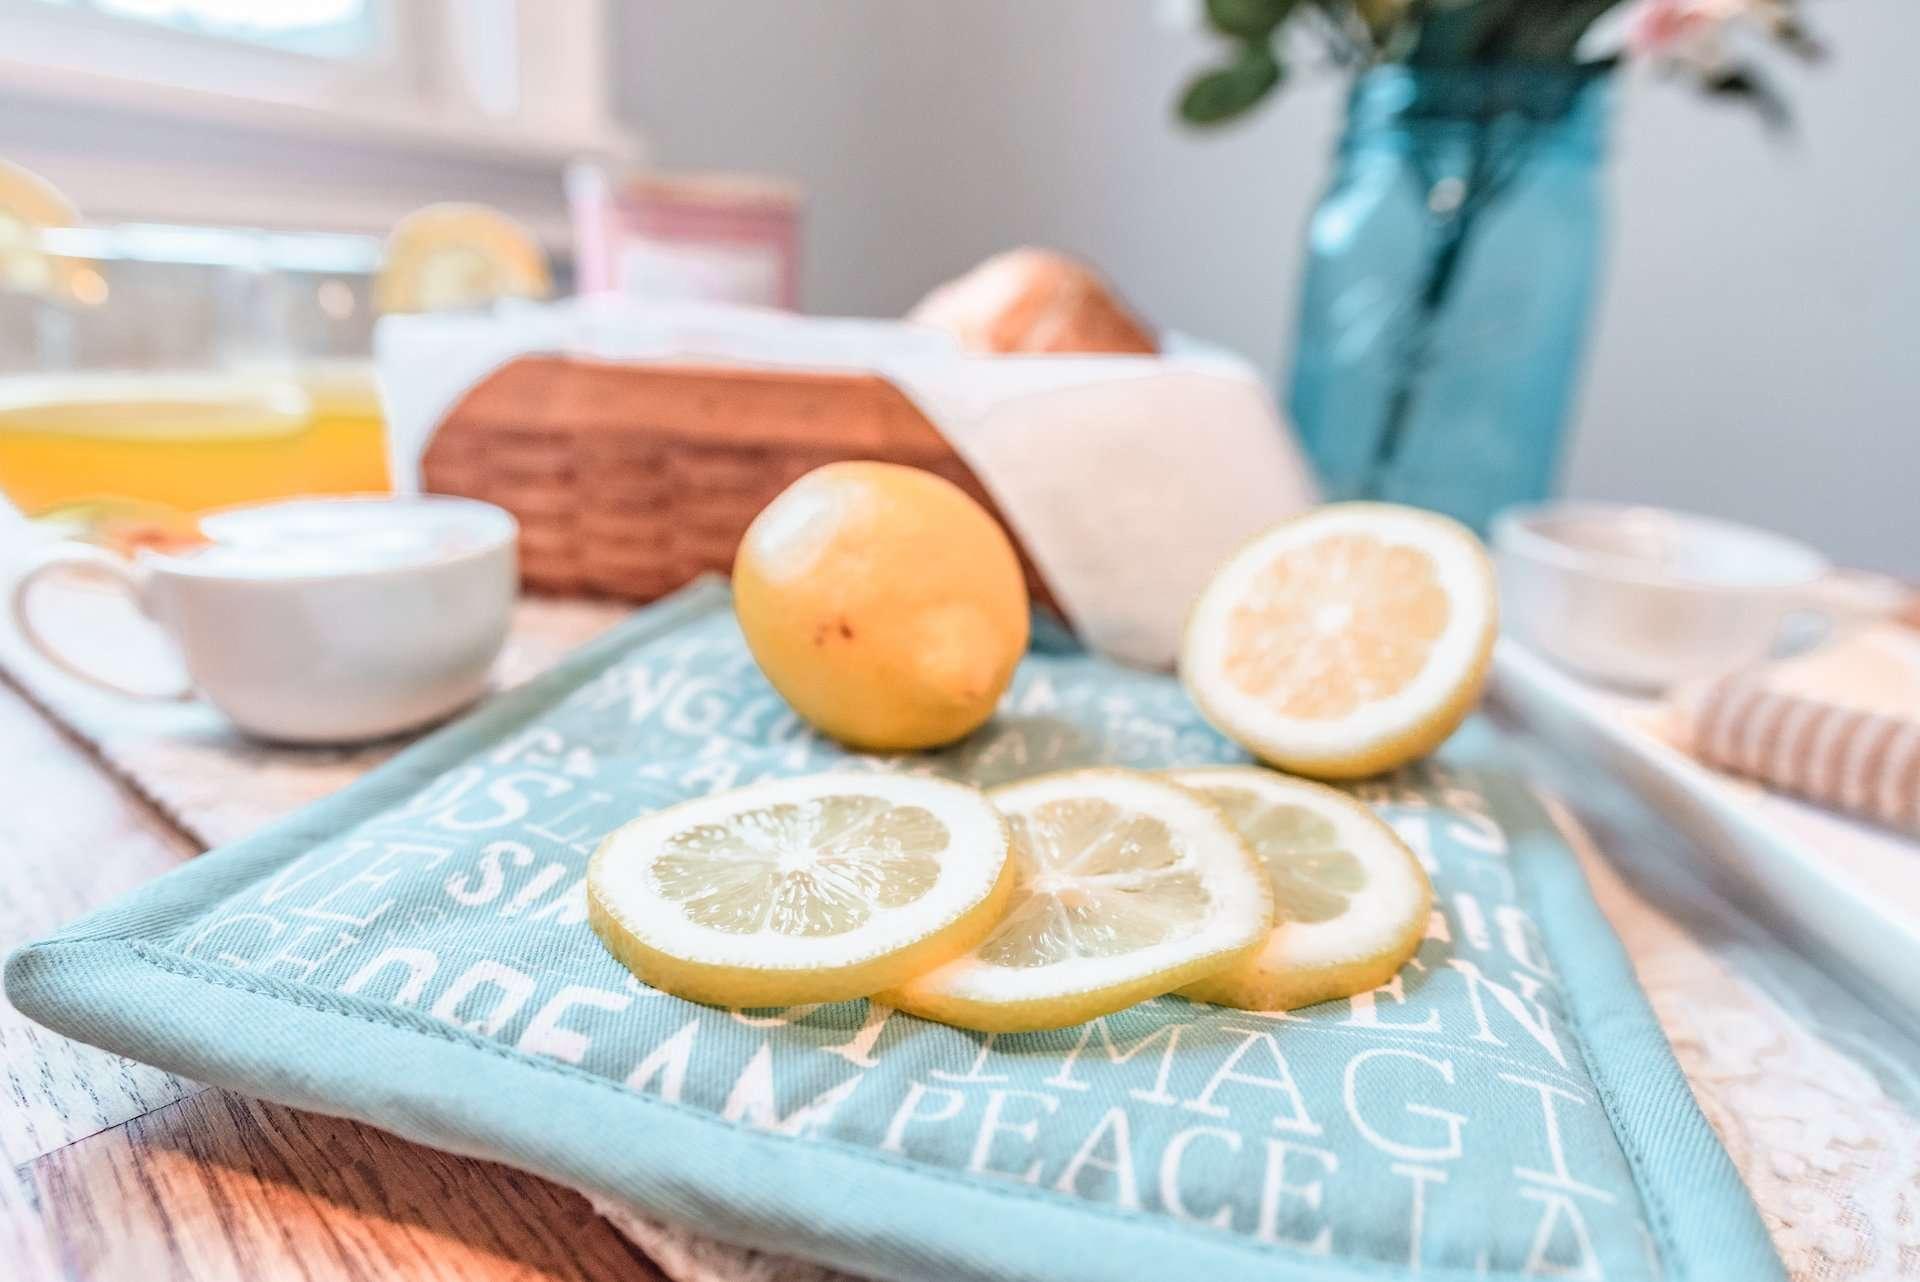 fresh cut lemons spread